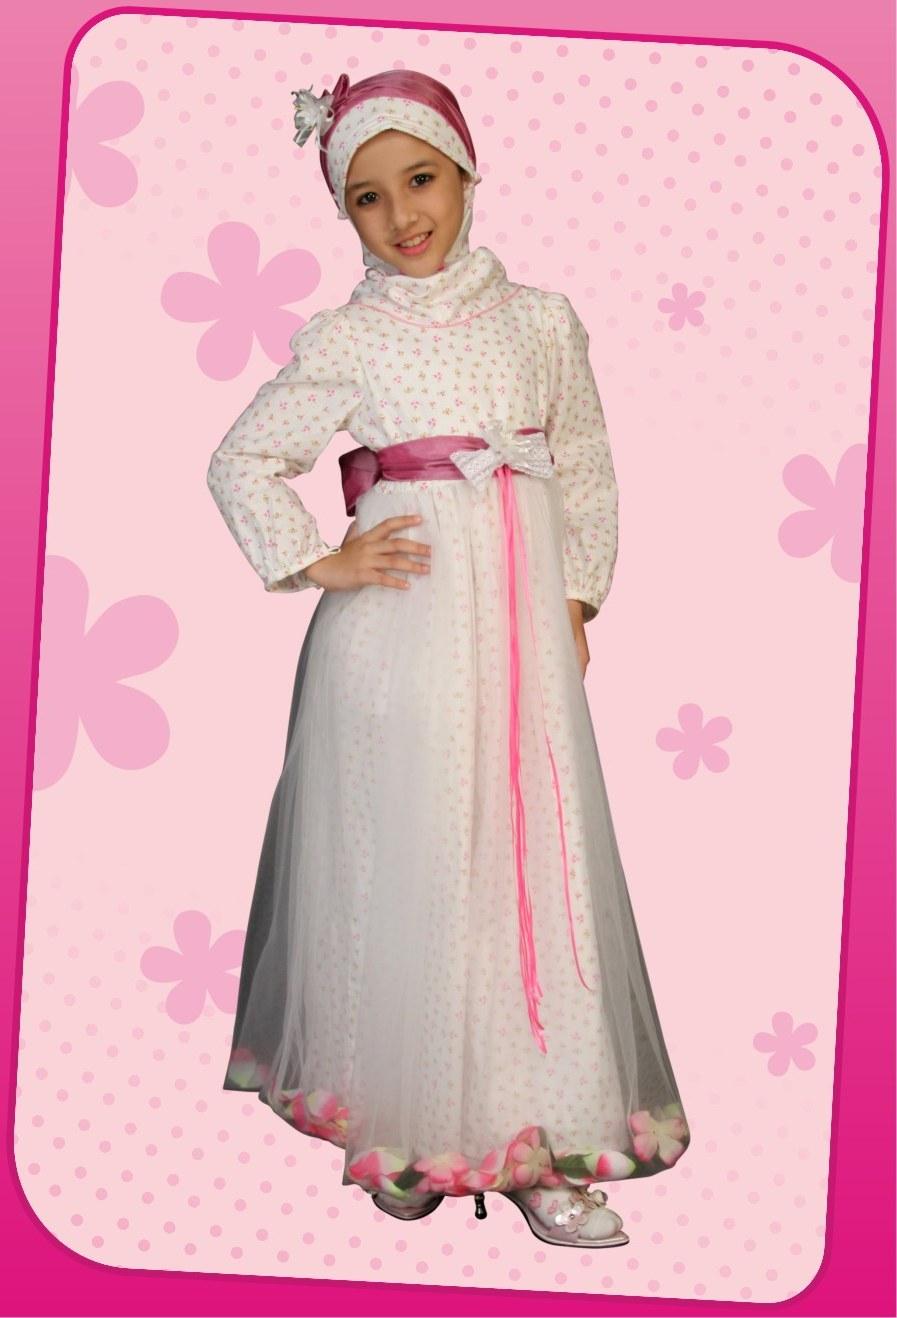 Design Trend Baju Lebaran Anak Perempuan 2018 Fmdf Trend Busana Muslim Anak Perempuan 2016 Busana Muslim Terbaru